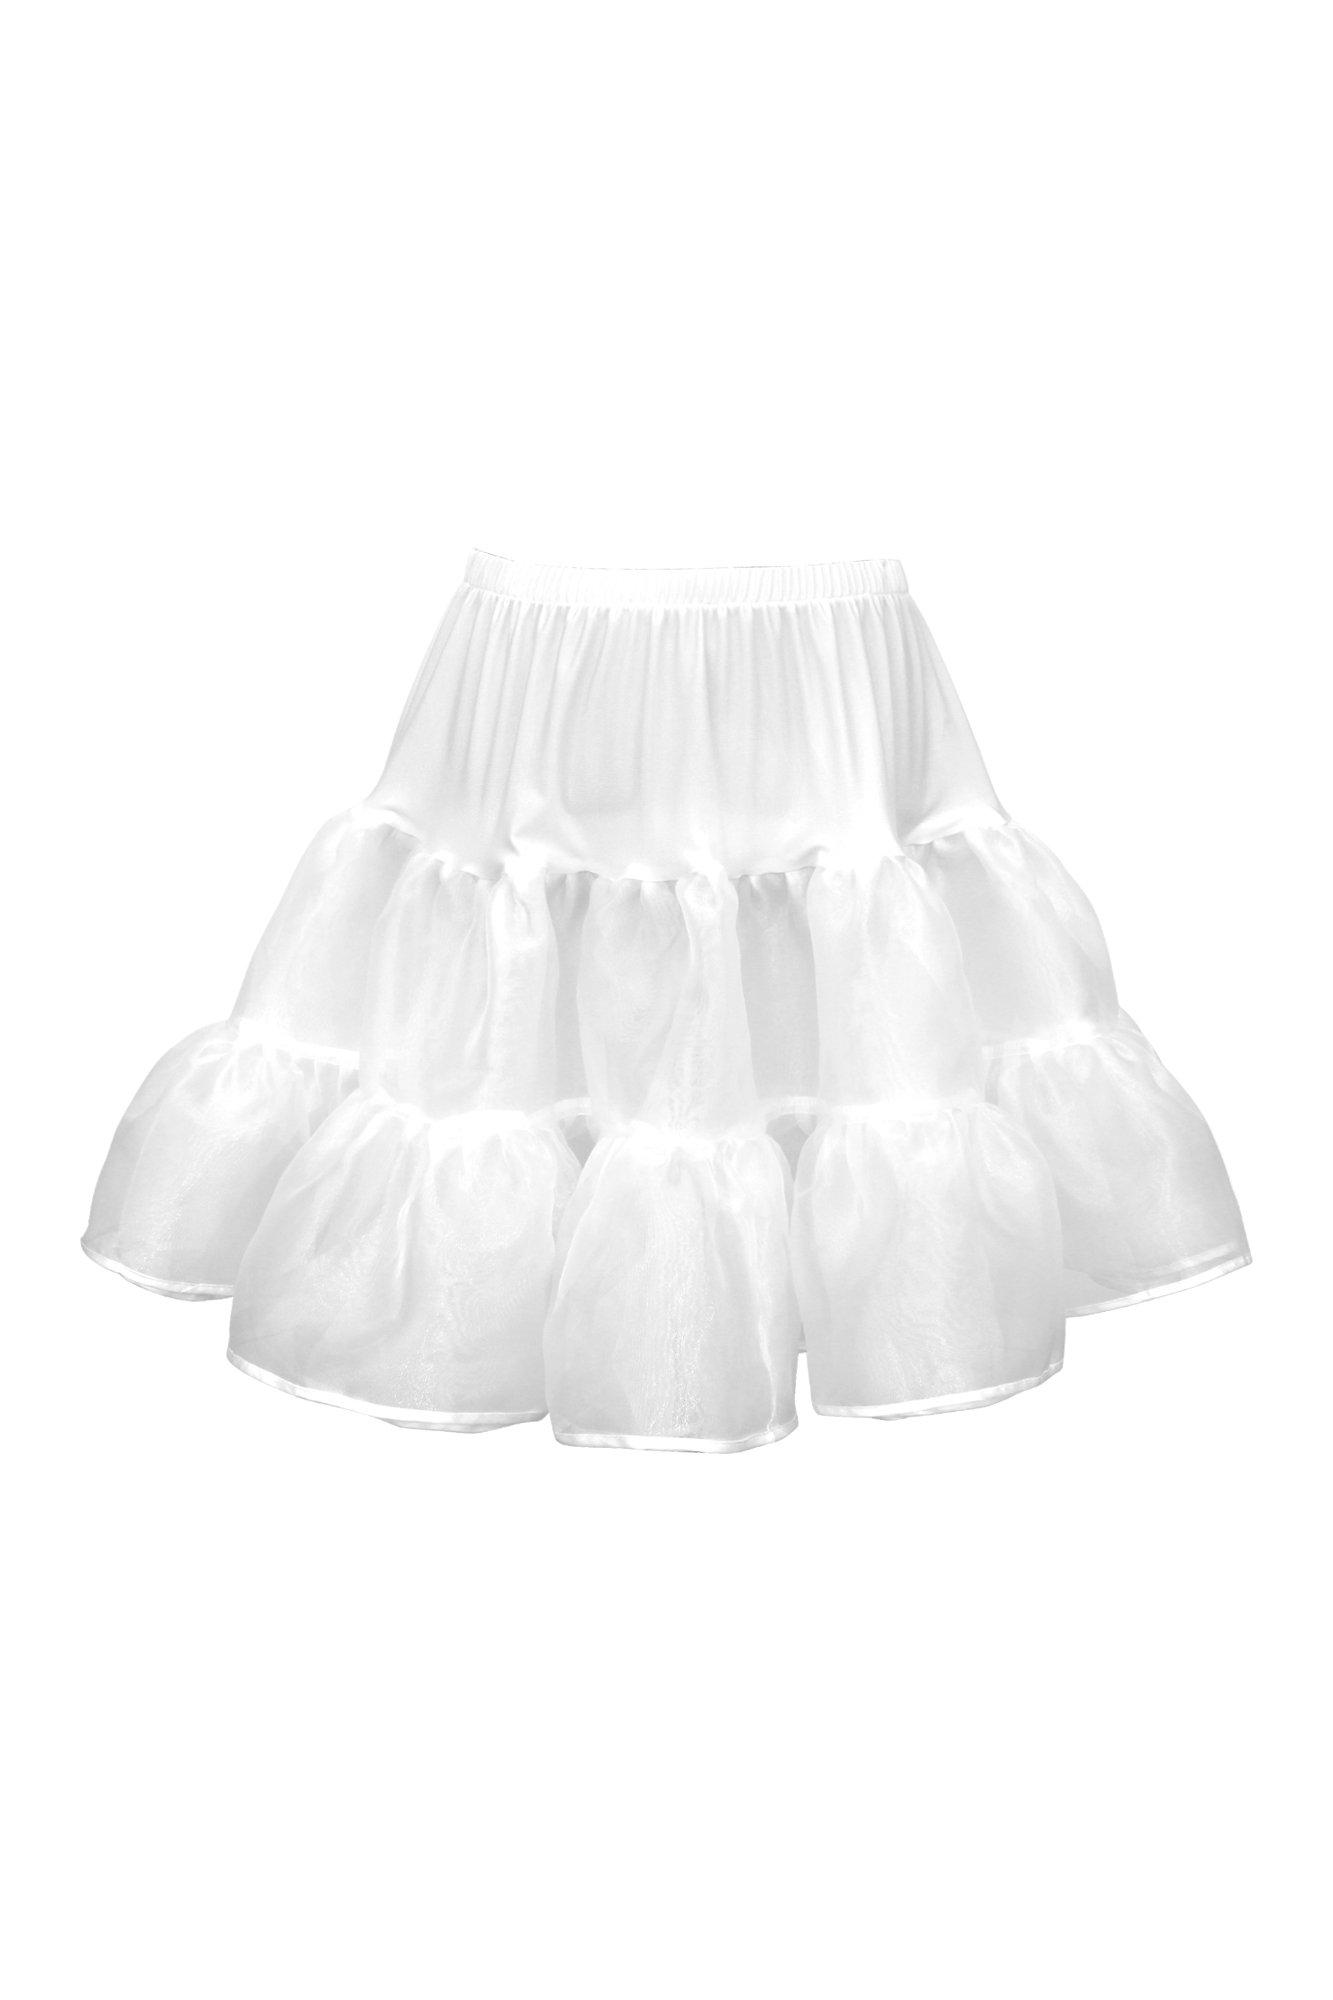 BlackButterfly Kids Organza Petticoat Skirt (White, 9-10 yrs)